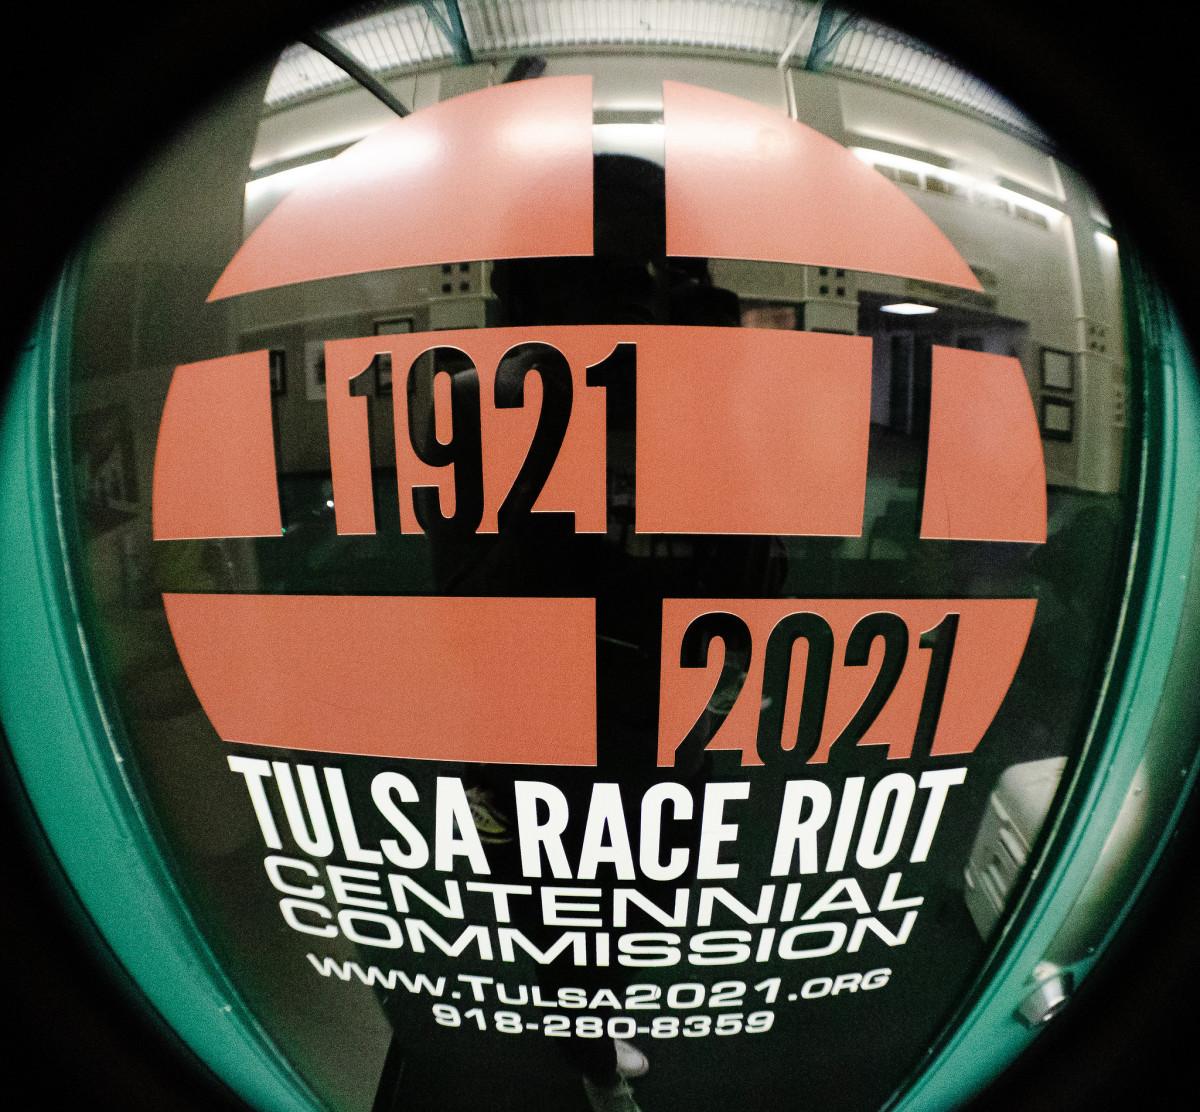 tulsa-race-riot-1921-bodt